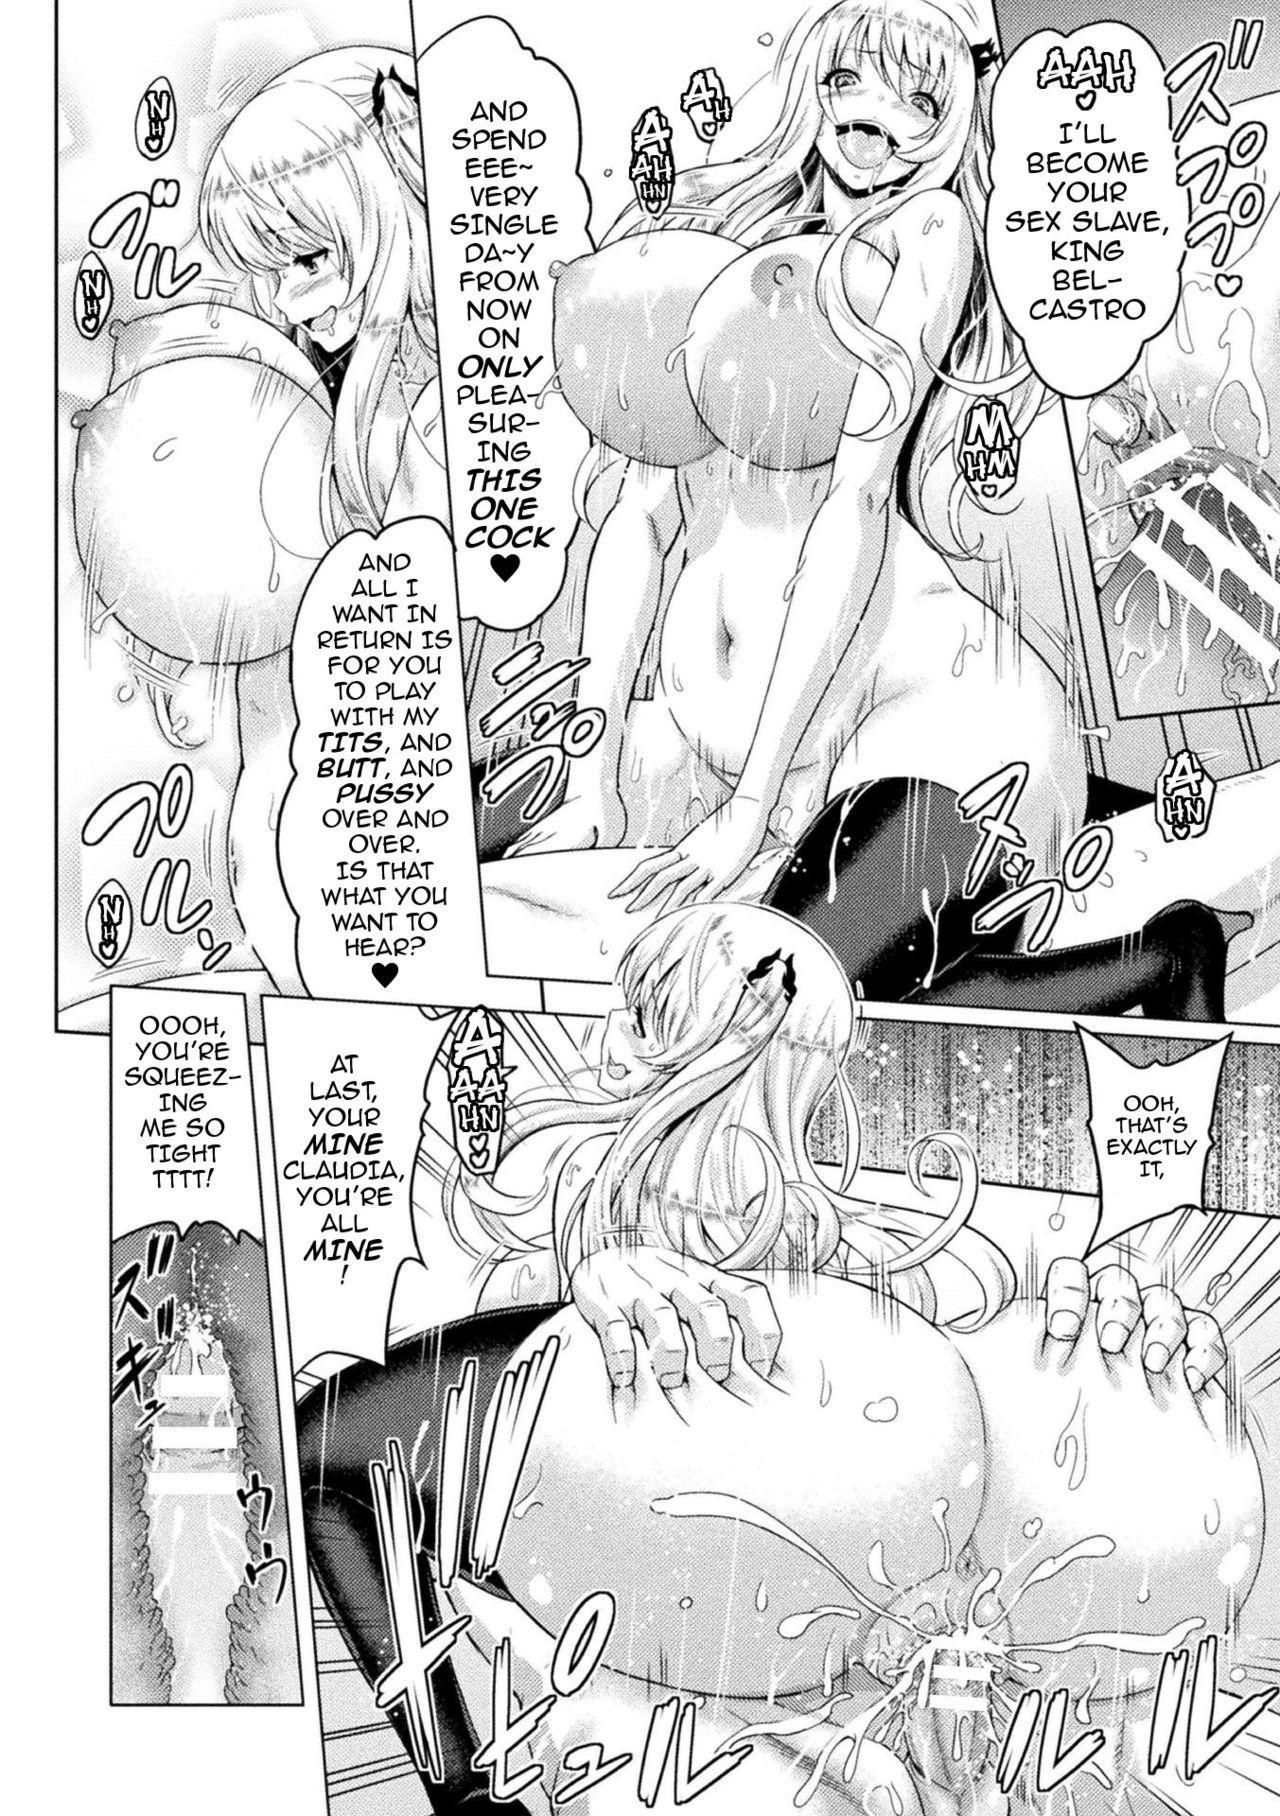 [Yamada Gogogo] Erona ~Orc no Inmon ni Okasareta Onna Kishi no Matsuro~   Erona ~The Fall of a Beautiful Knight Cursed with the Lewd Mark of an Orc~ Ch. 1-6 [English] {darknight} 92